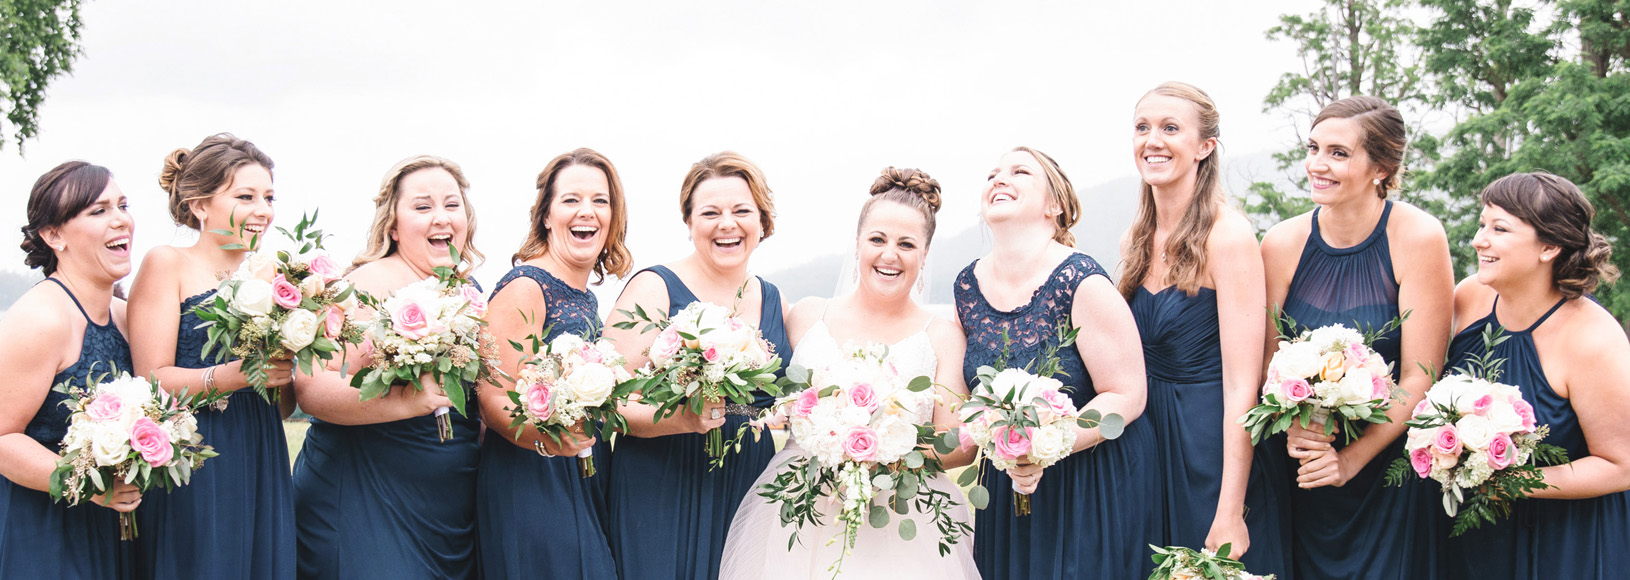 monika normand photography bridesmaids laughing